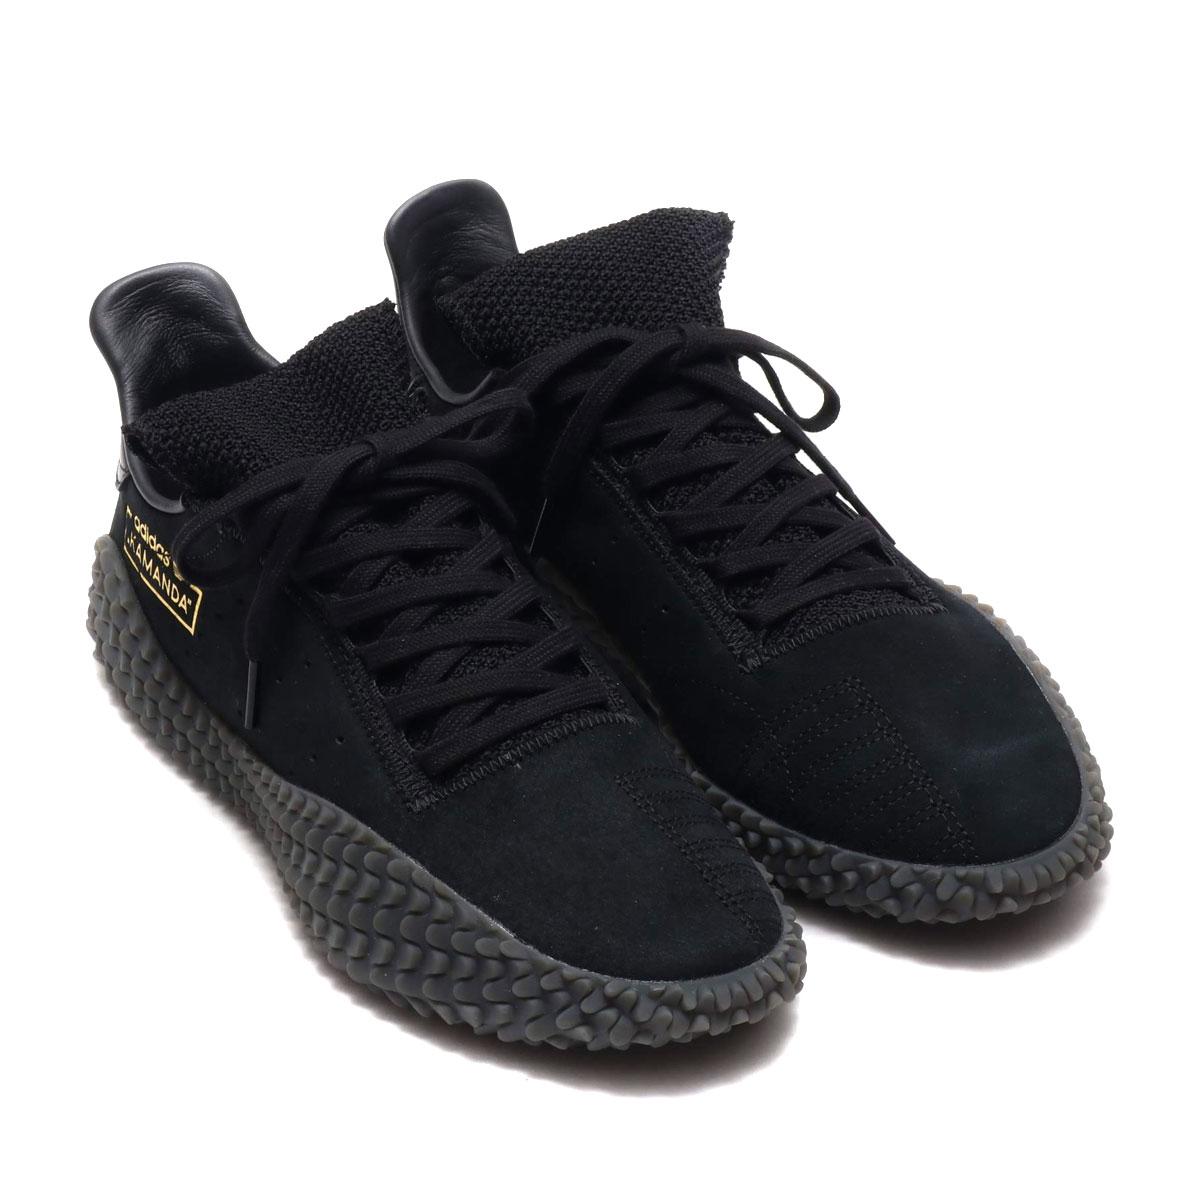 adidas Originals KAMANDA01 (アディダスオリジナルス カマンダ01)CORE BLACK/CORE BLACK/CARBON【メンズ スニーカー】19SS-I